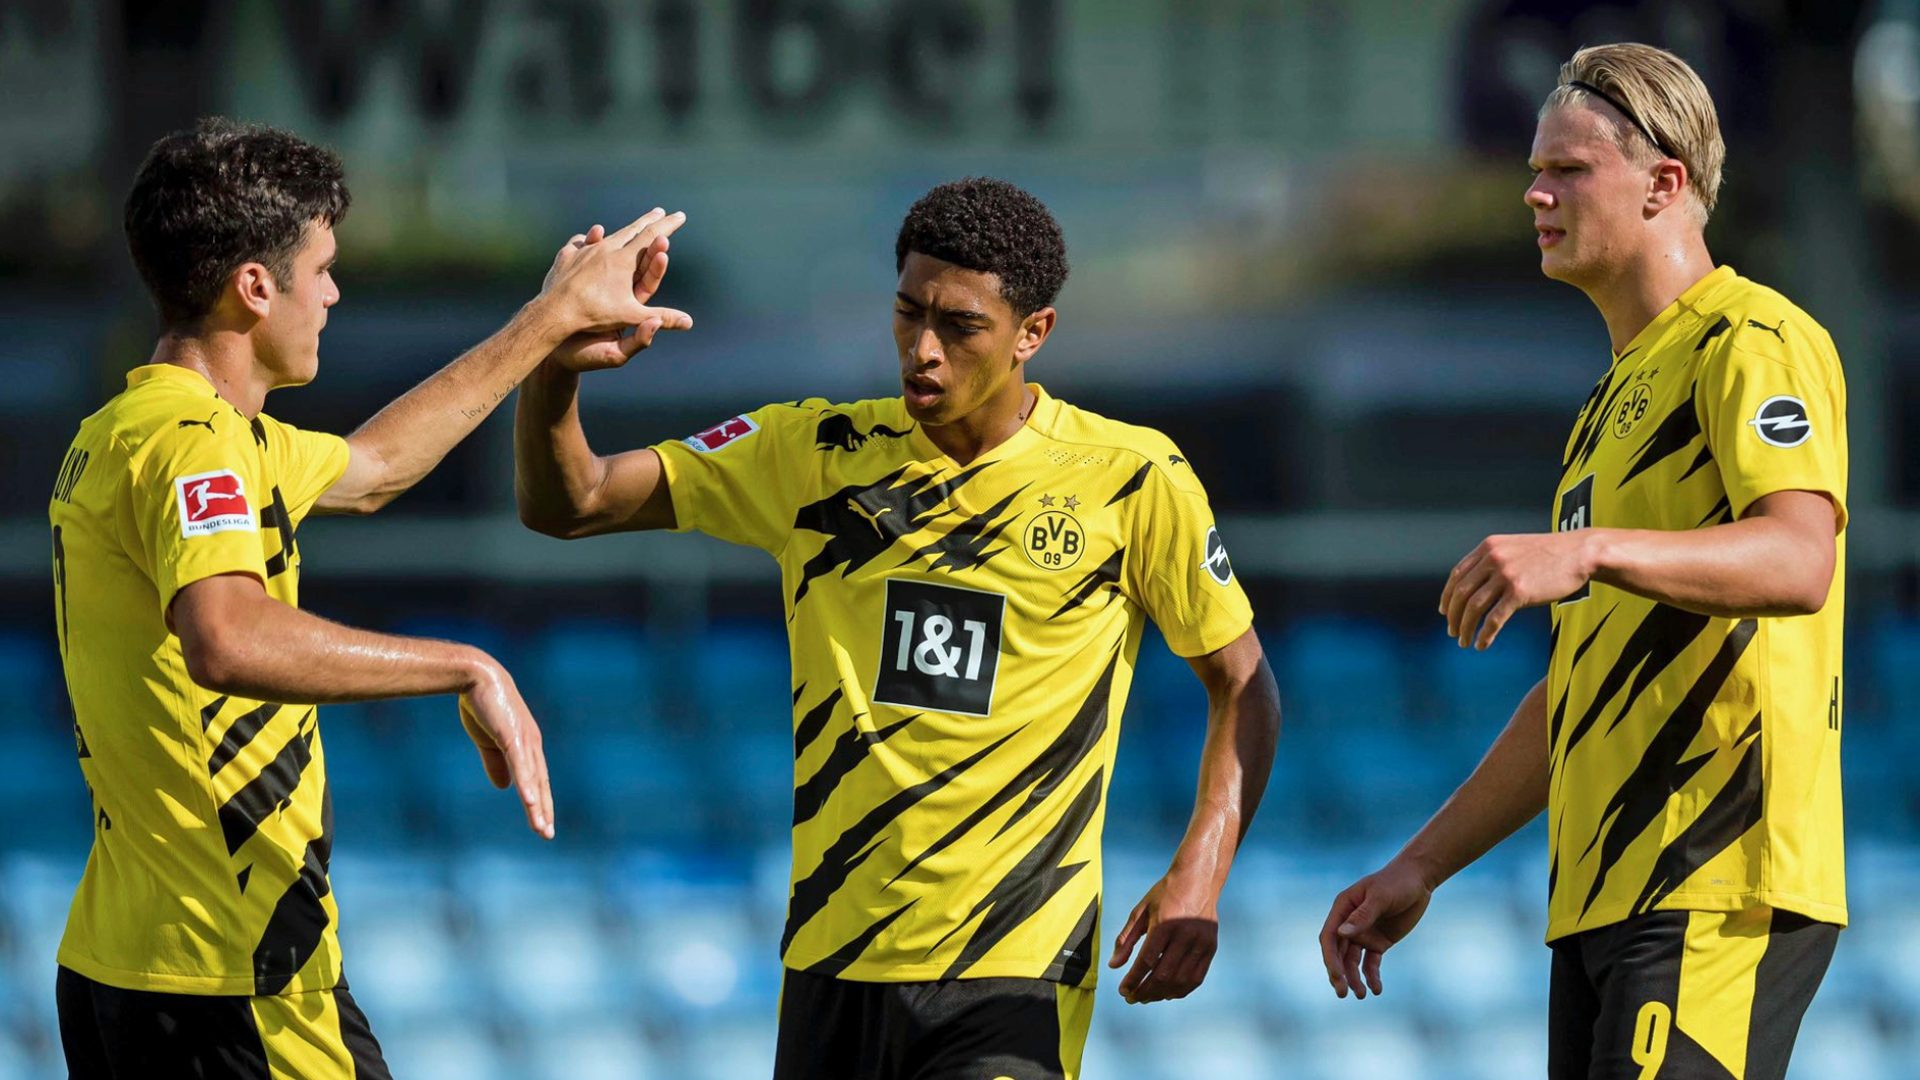 Bundesliga | Jude Bellingham and Erling Haaland star in Borussia Dortmund's  first 2020/21 pre-season win